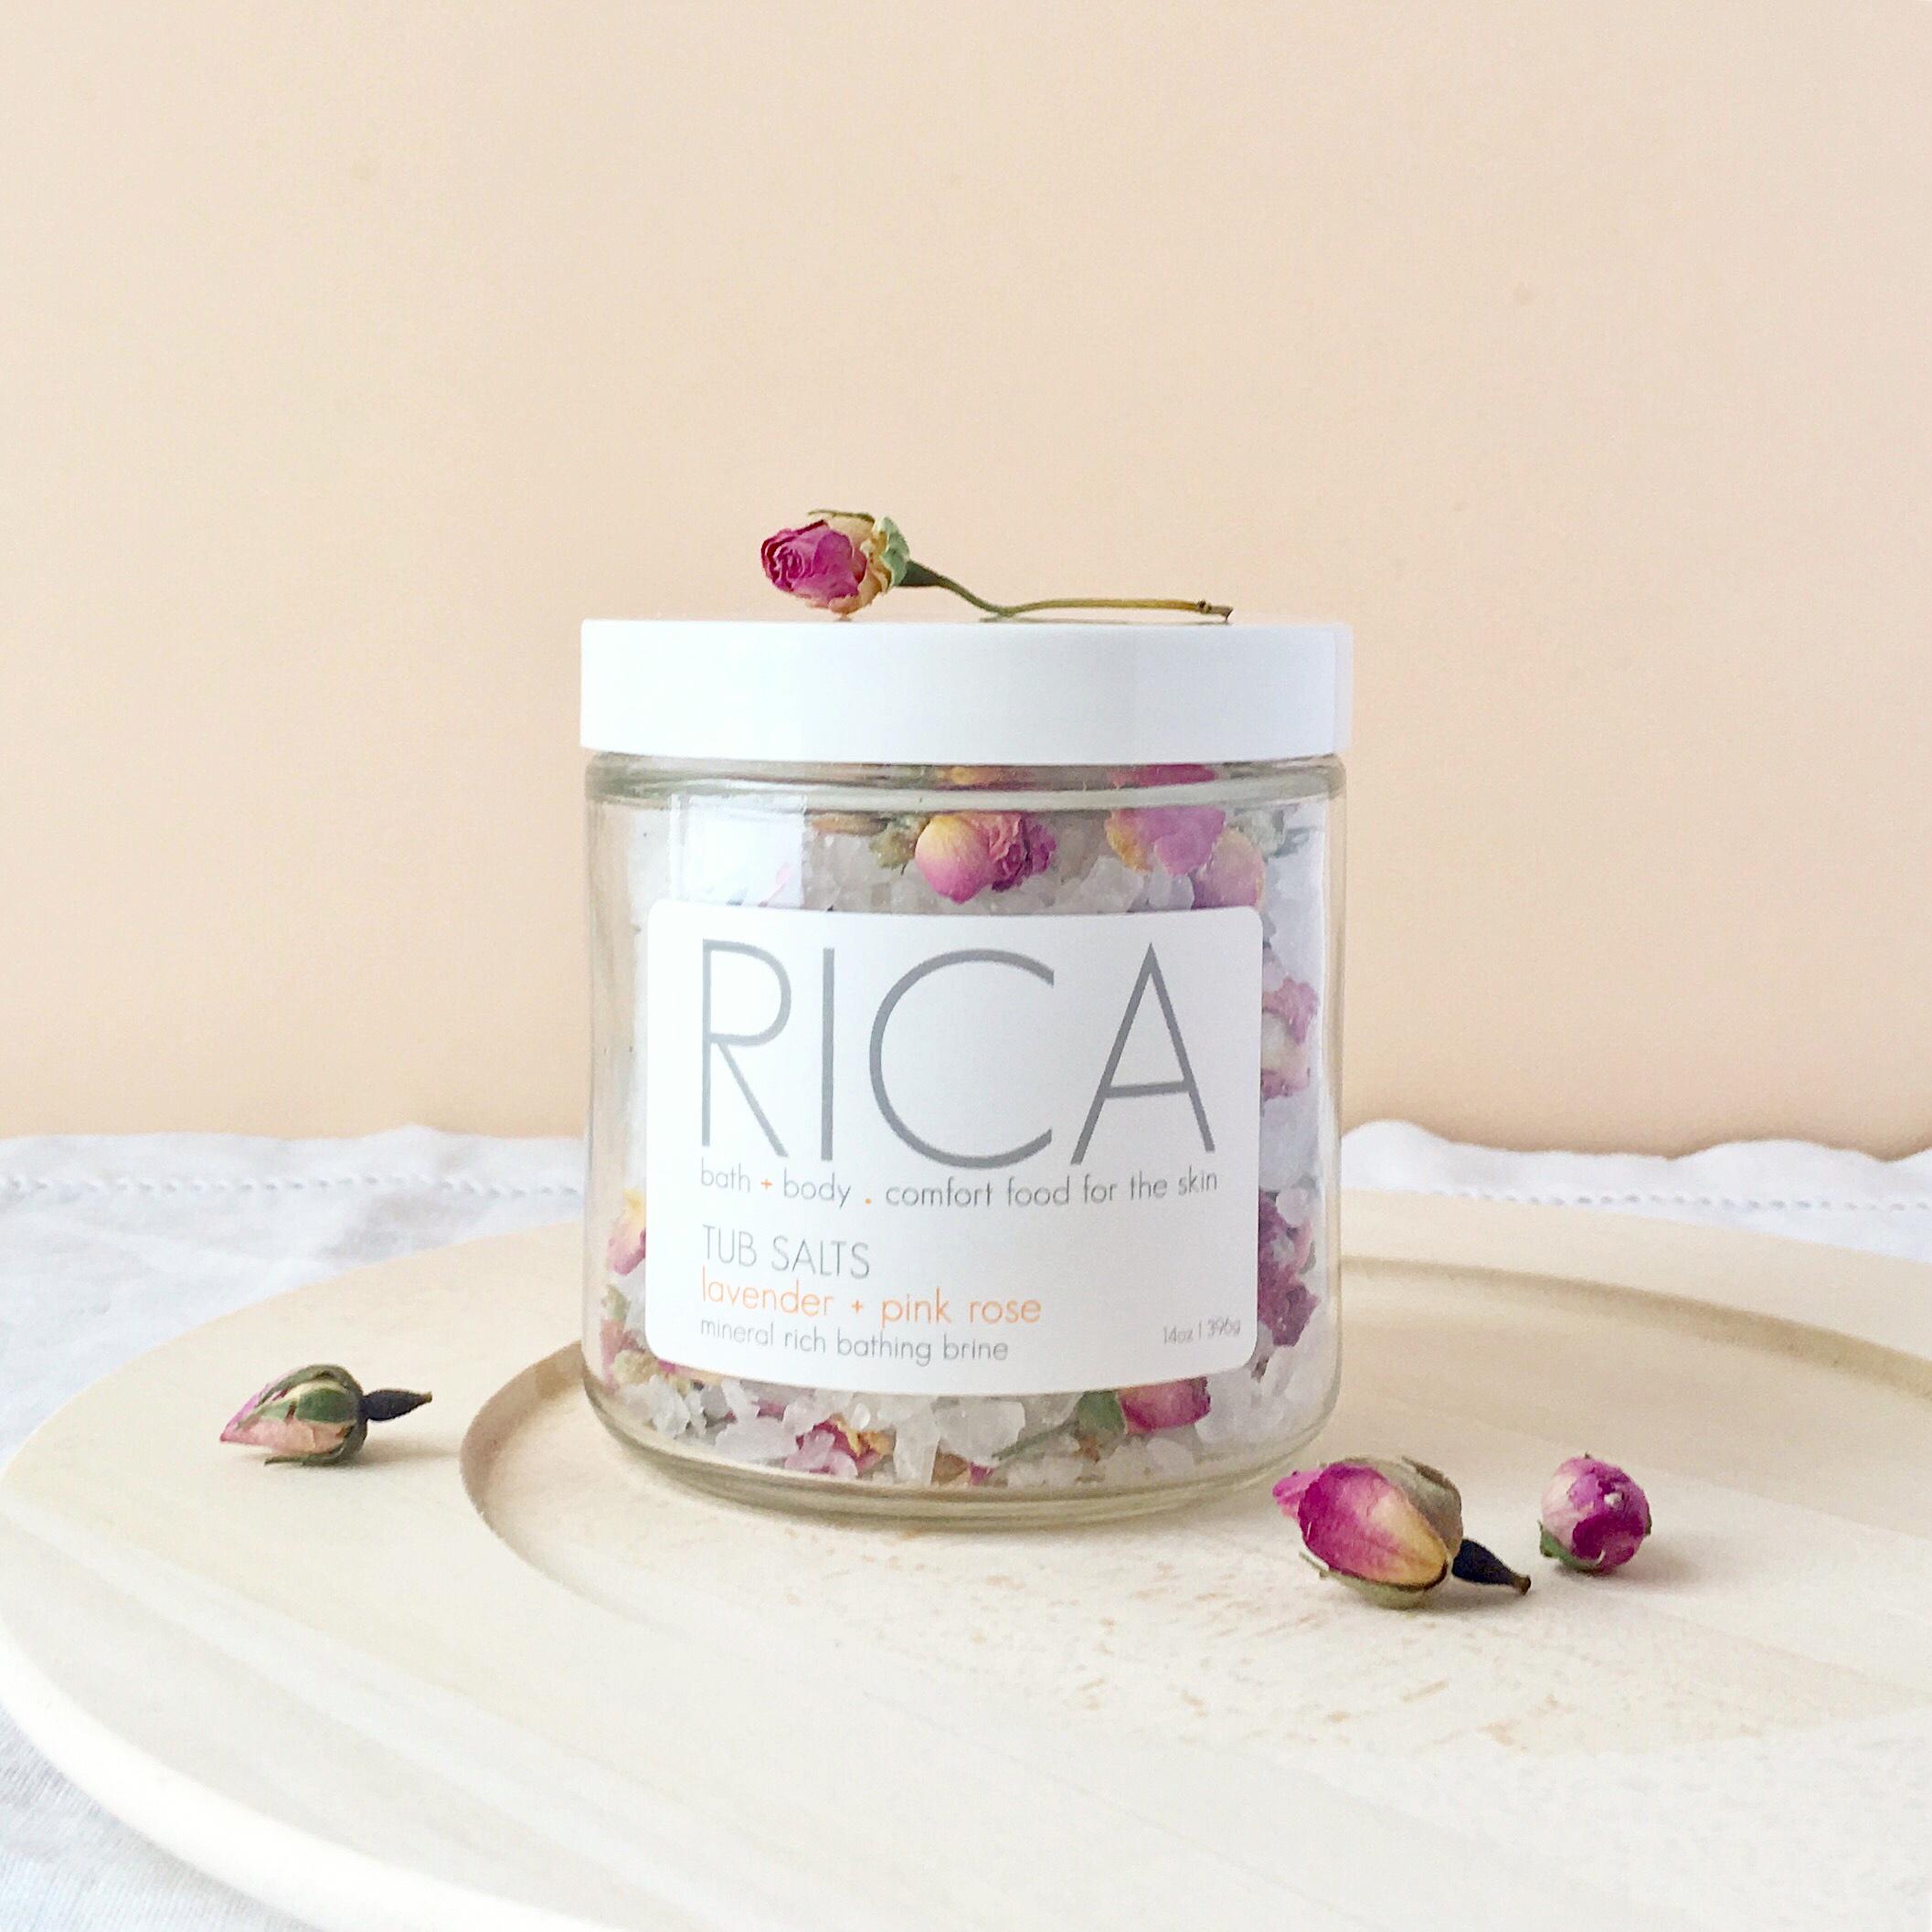 Tub Salts Lavender + Pink Rose